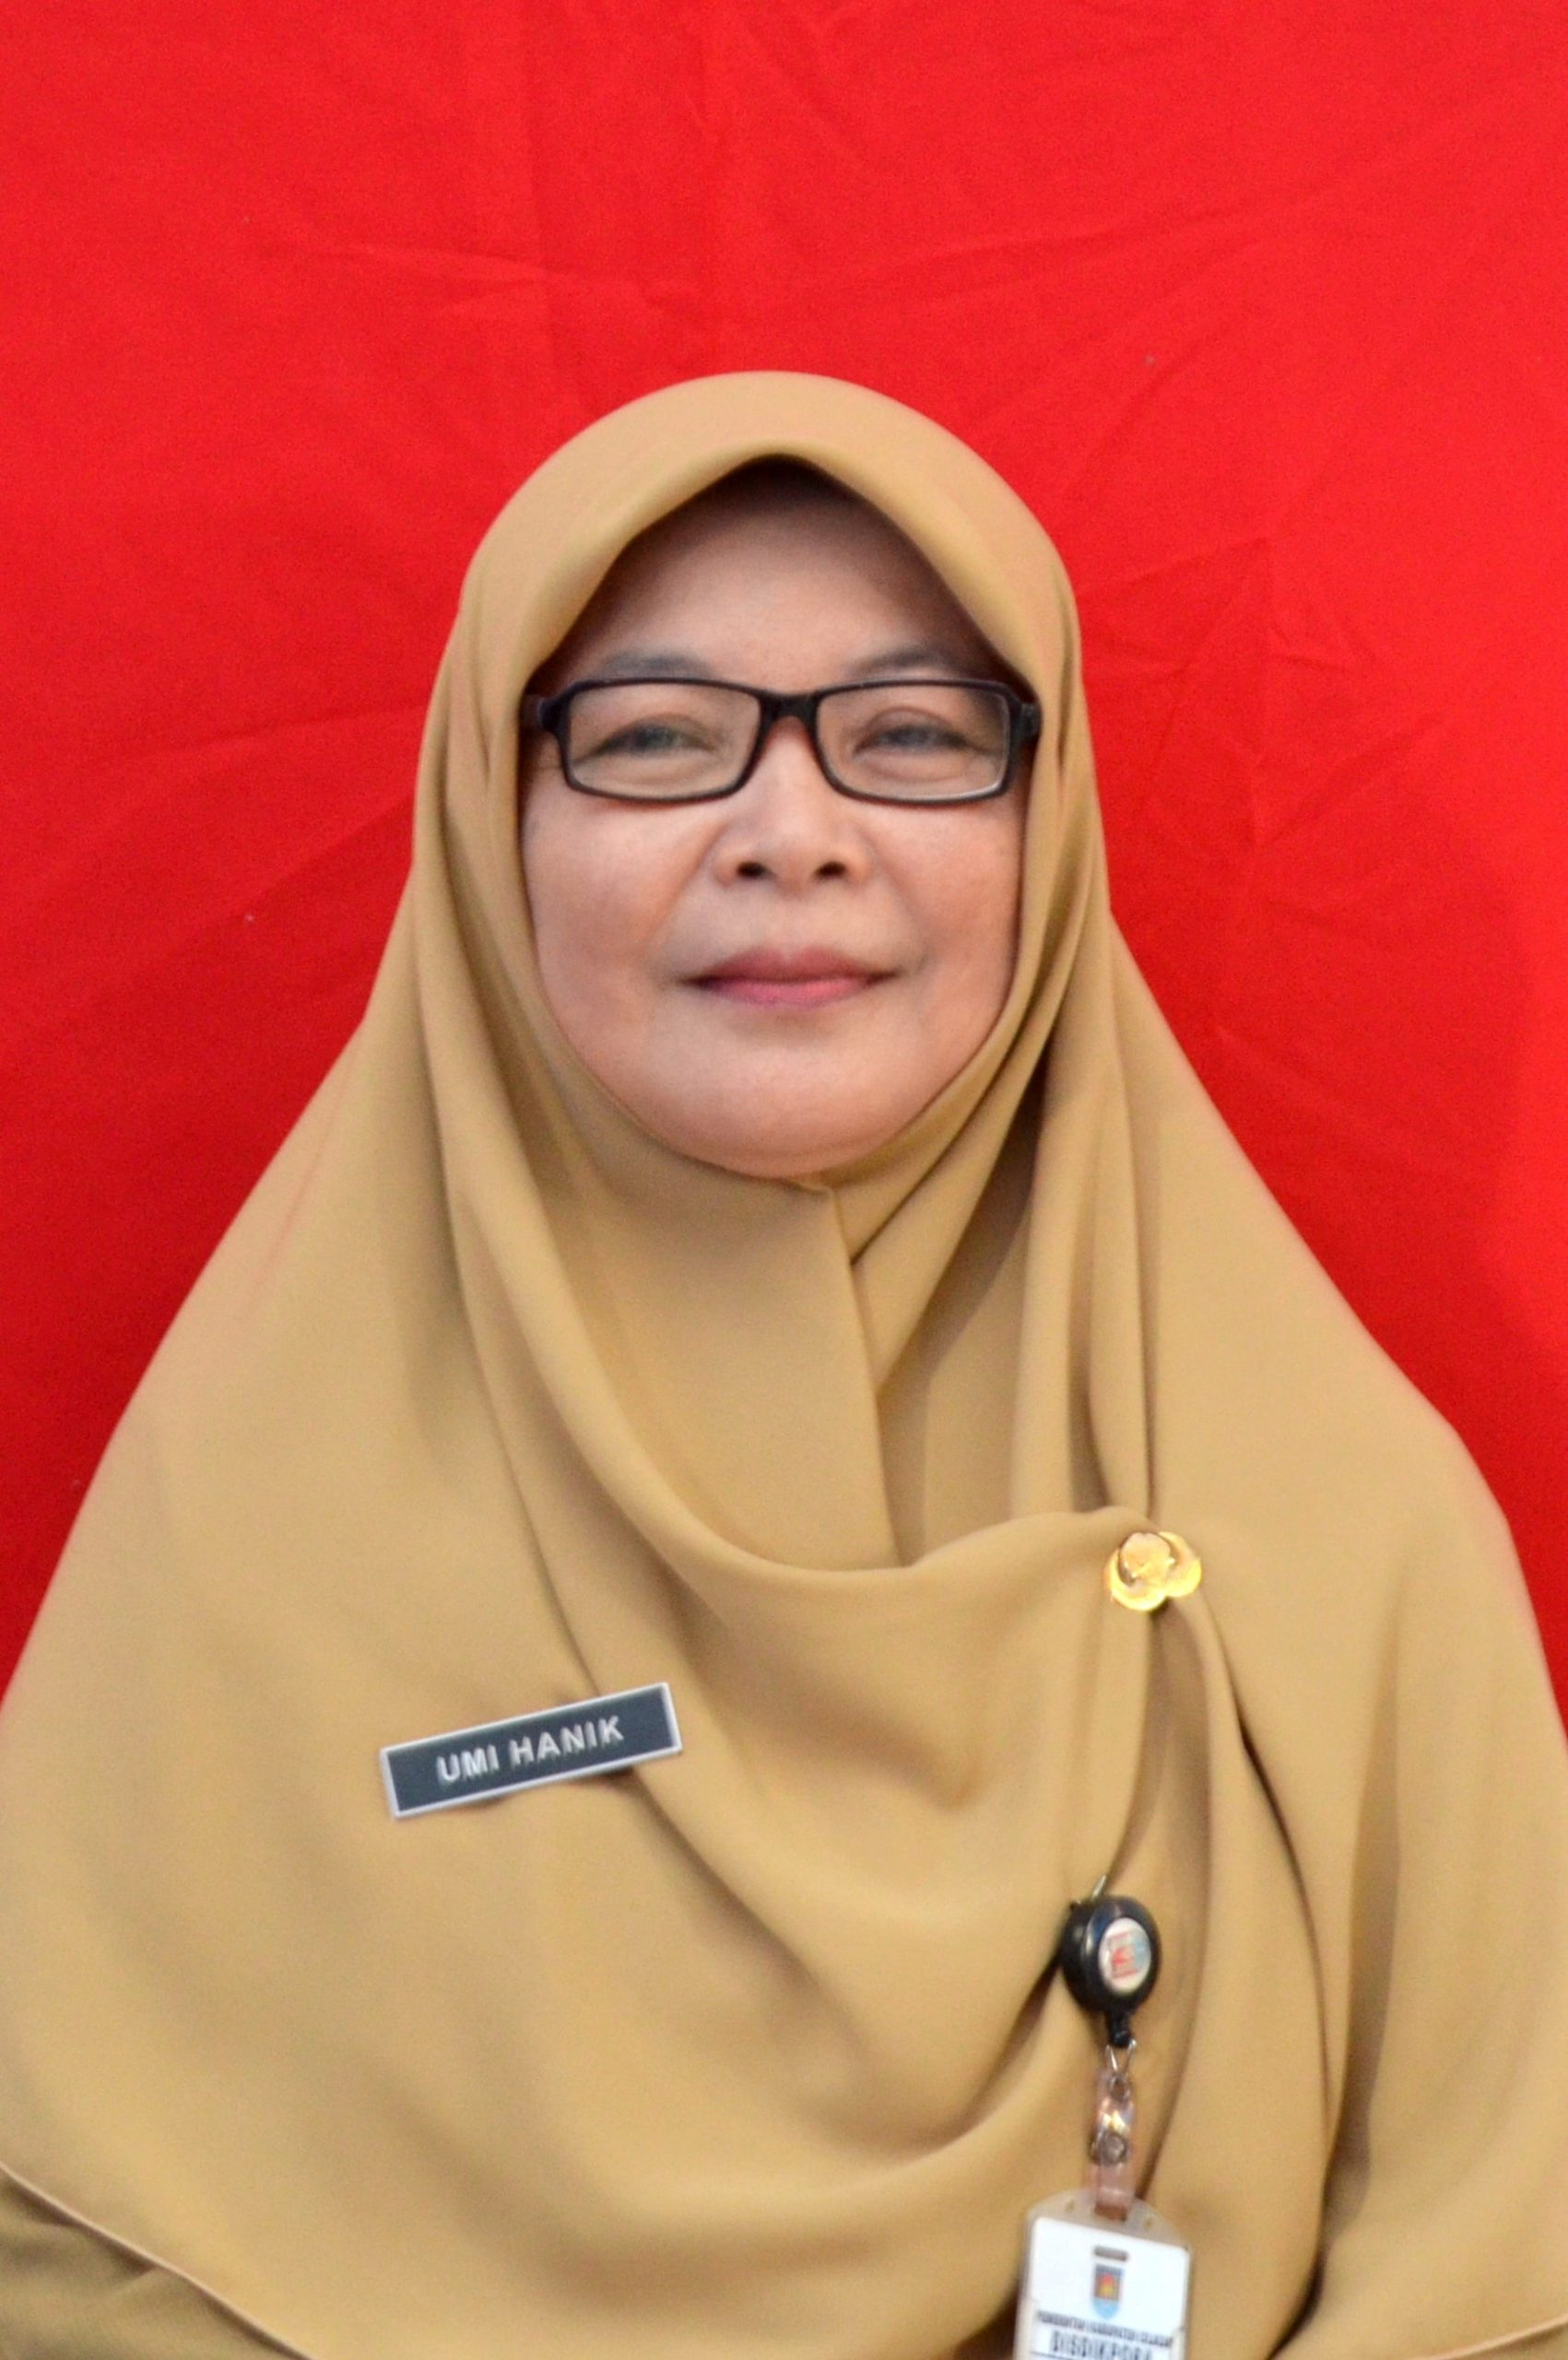 Dra. Umi Hanik